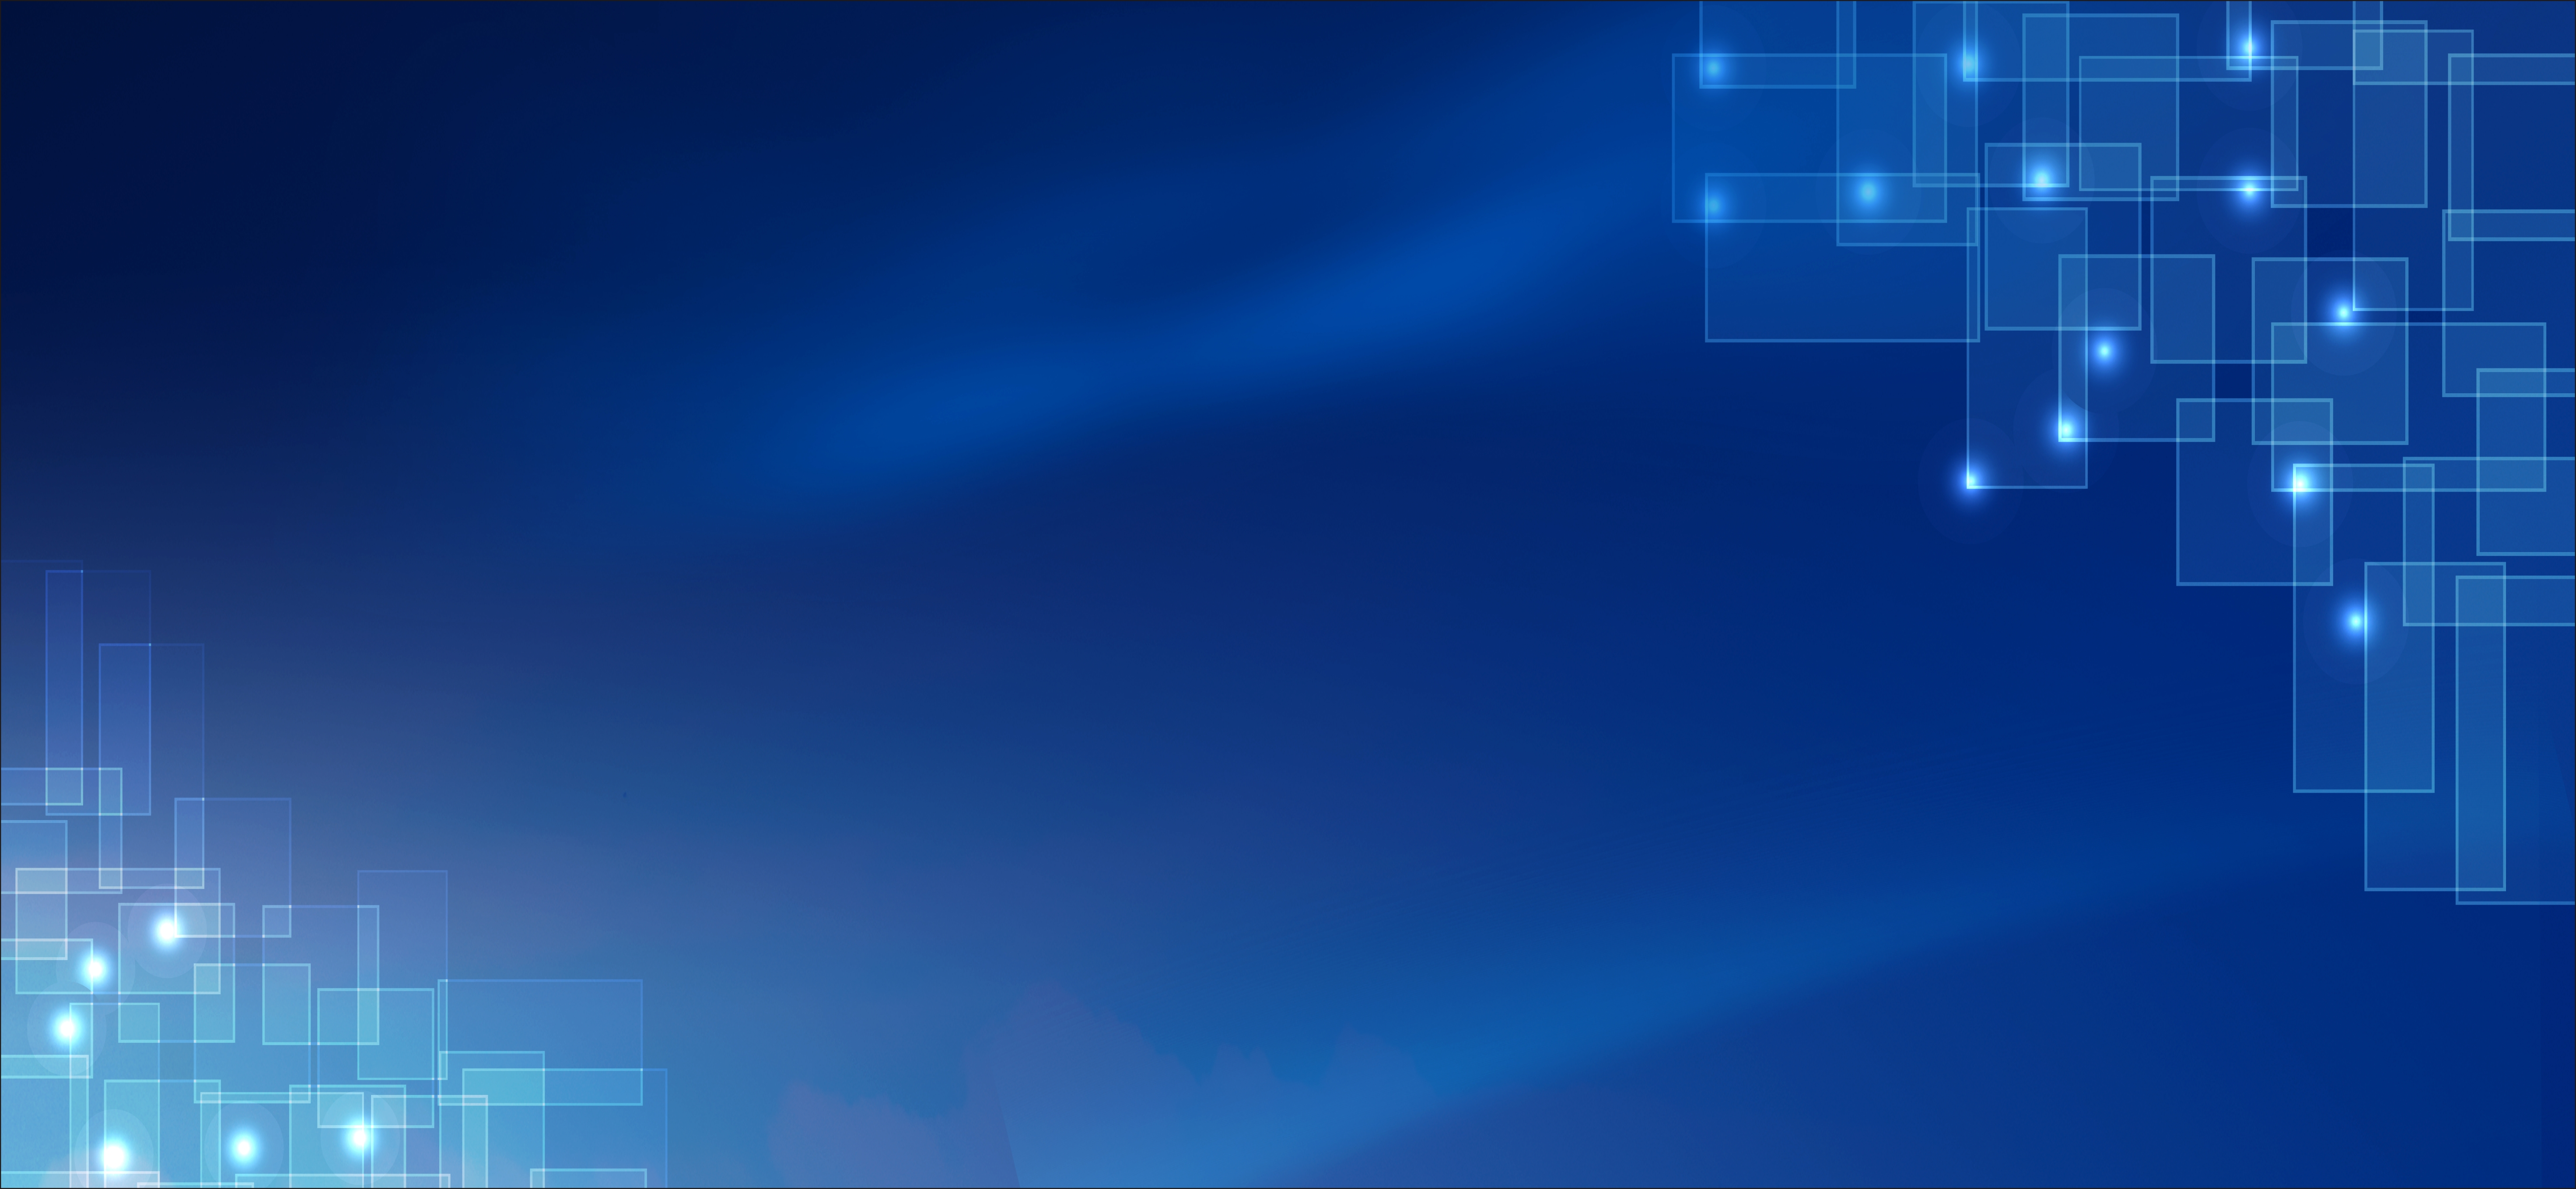 fondo azul degradado luminiscentes cambio gradual azul la